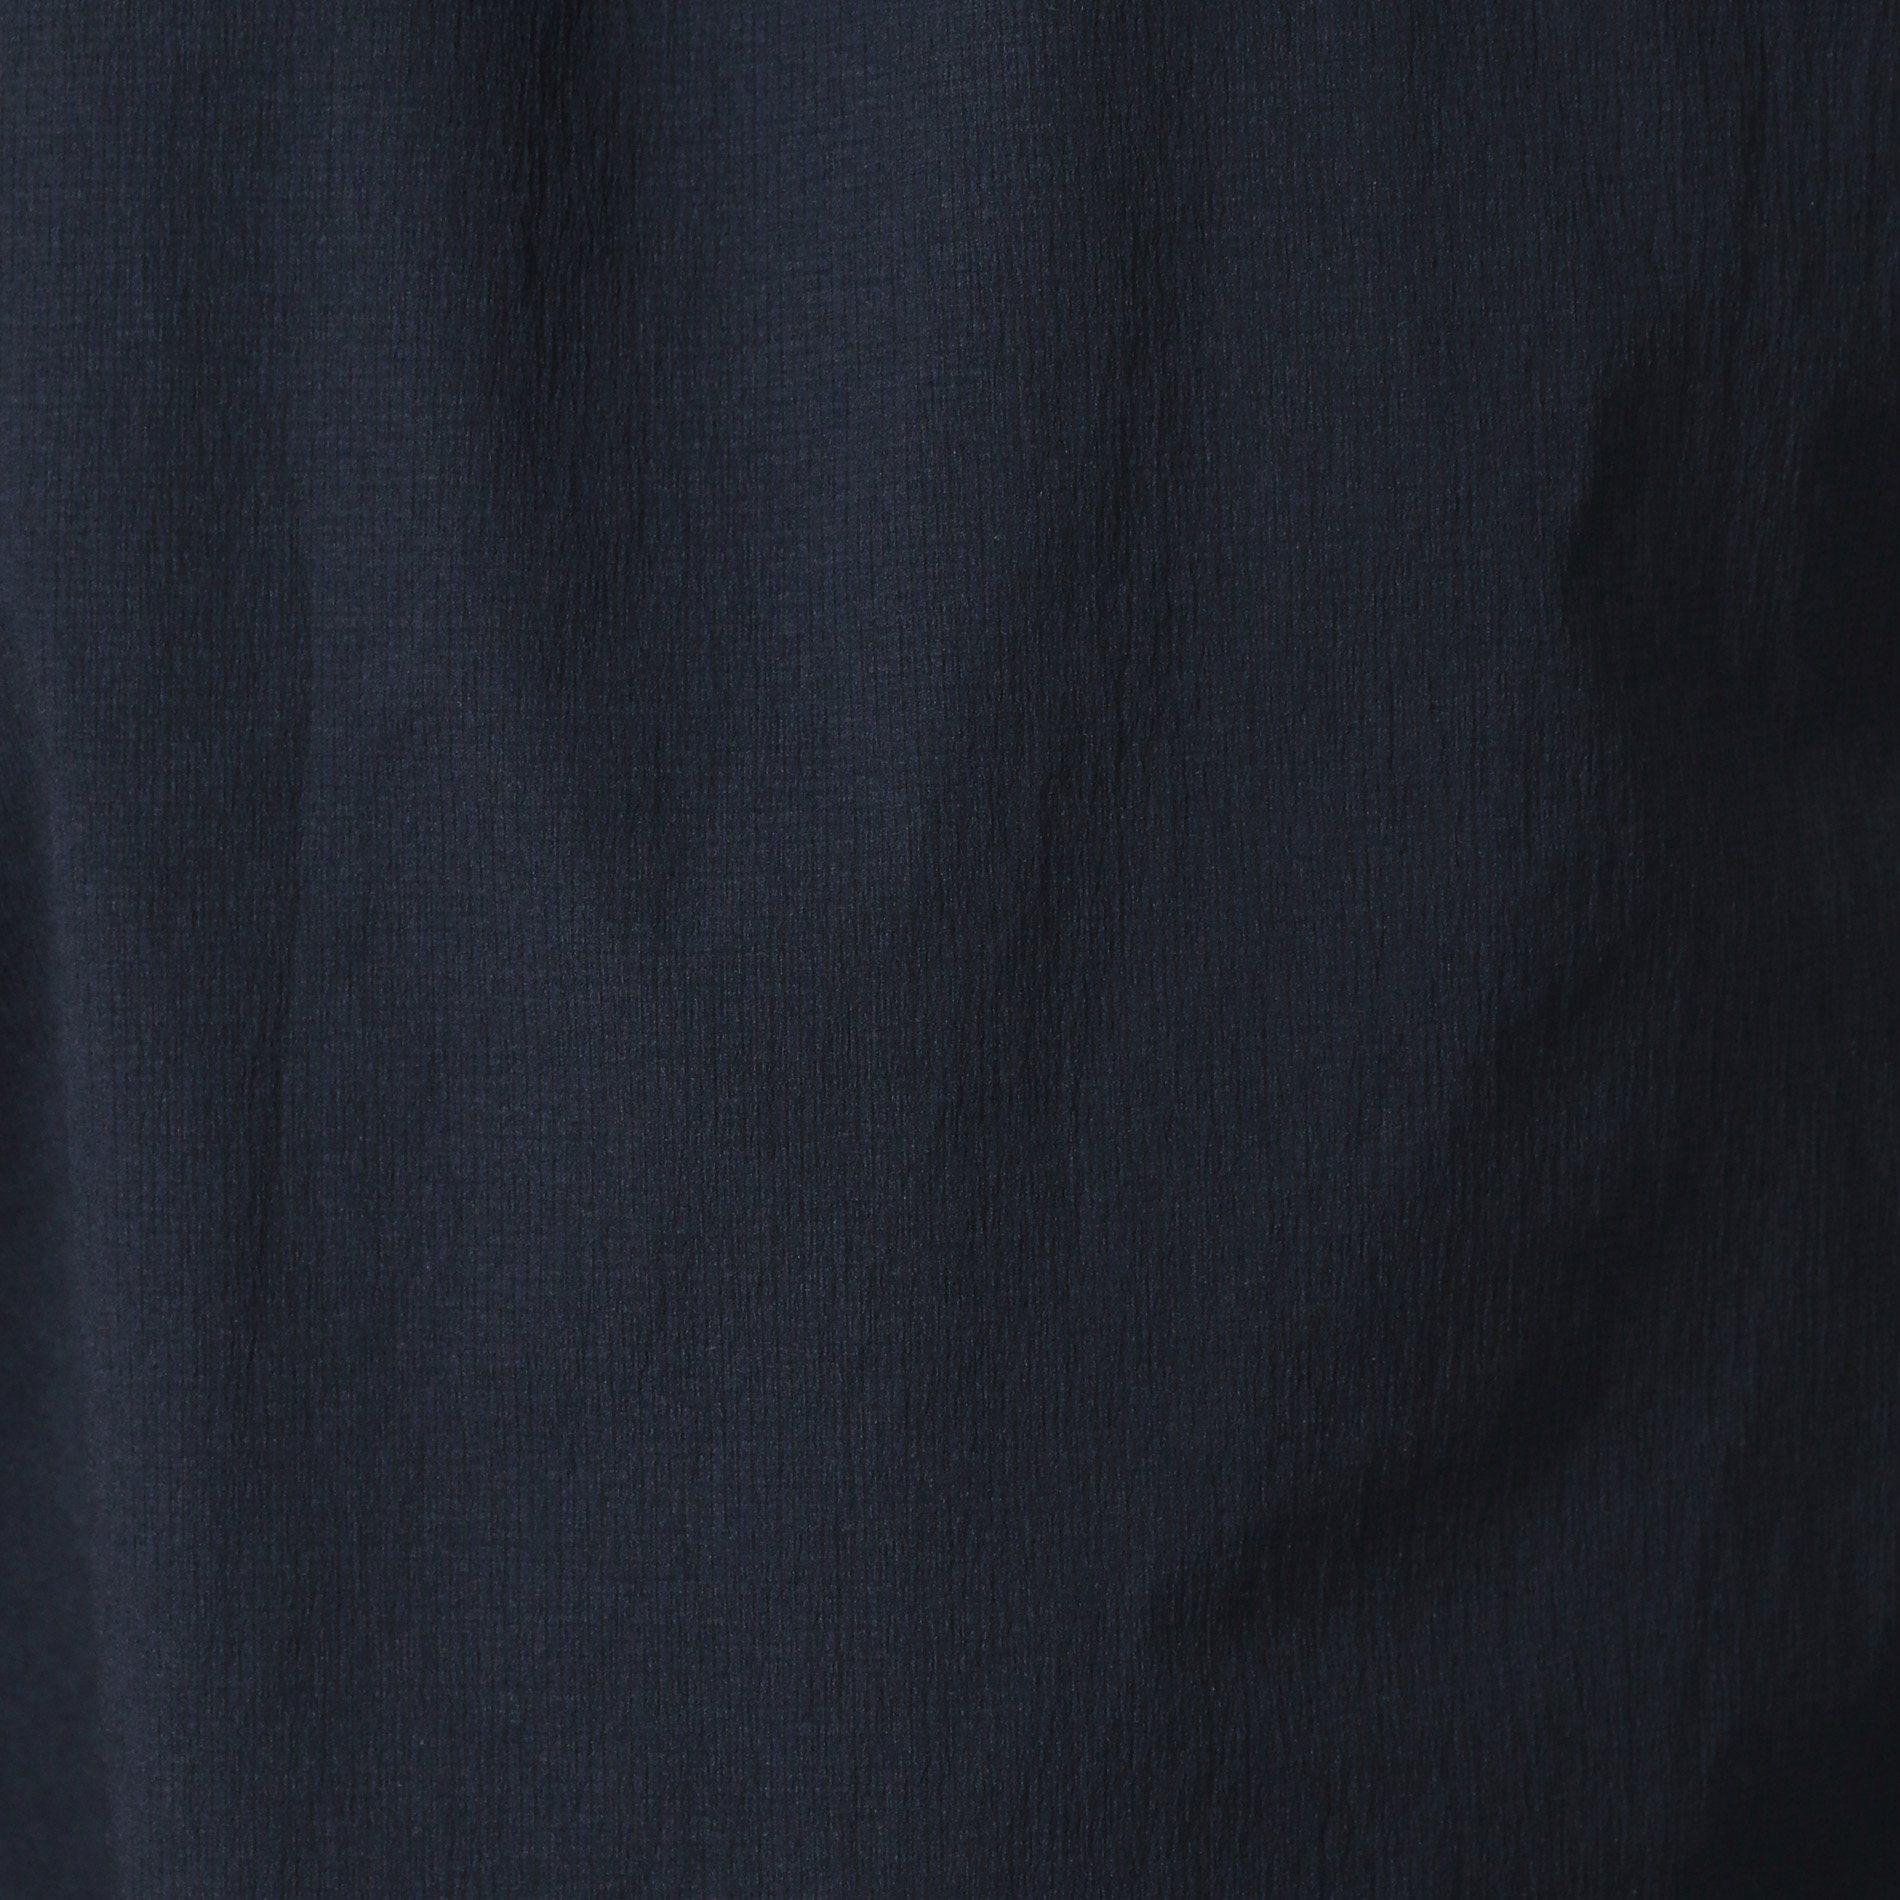 【FEATHER-TECH PAC】【DRY RIP】シャーリングショートパンツ